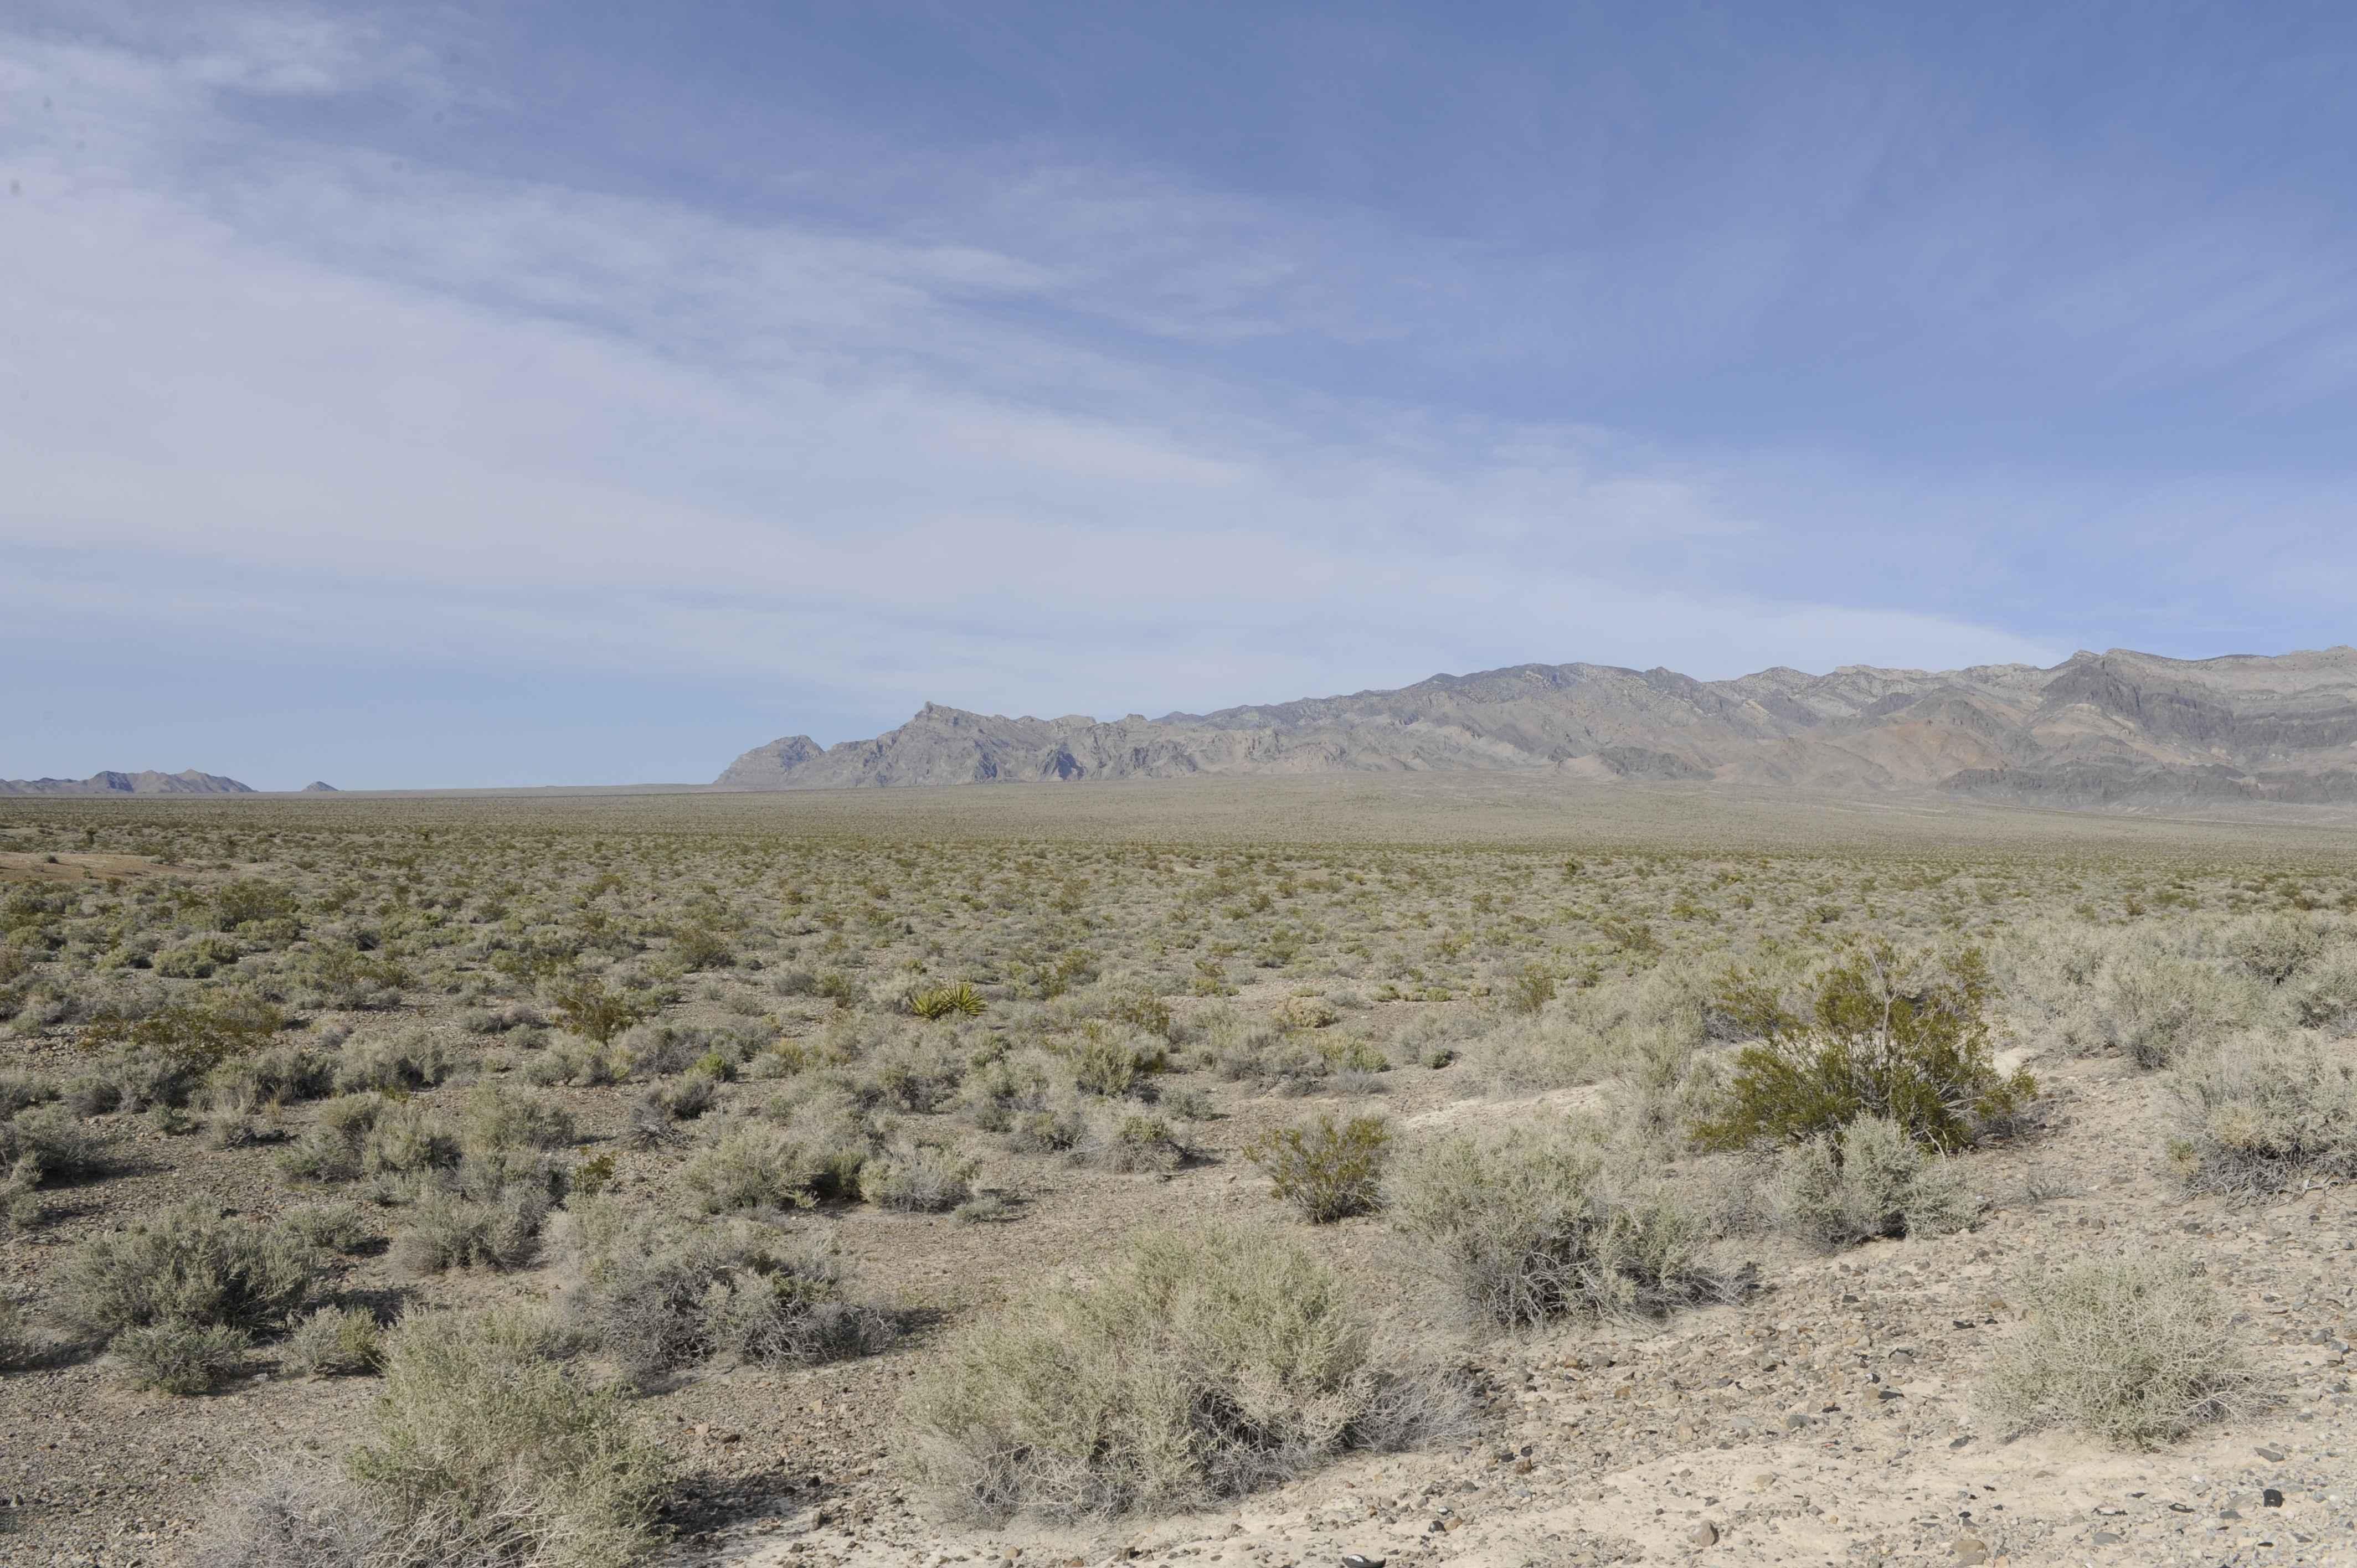 File:A scenic view of the desert landscape on the desert ...